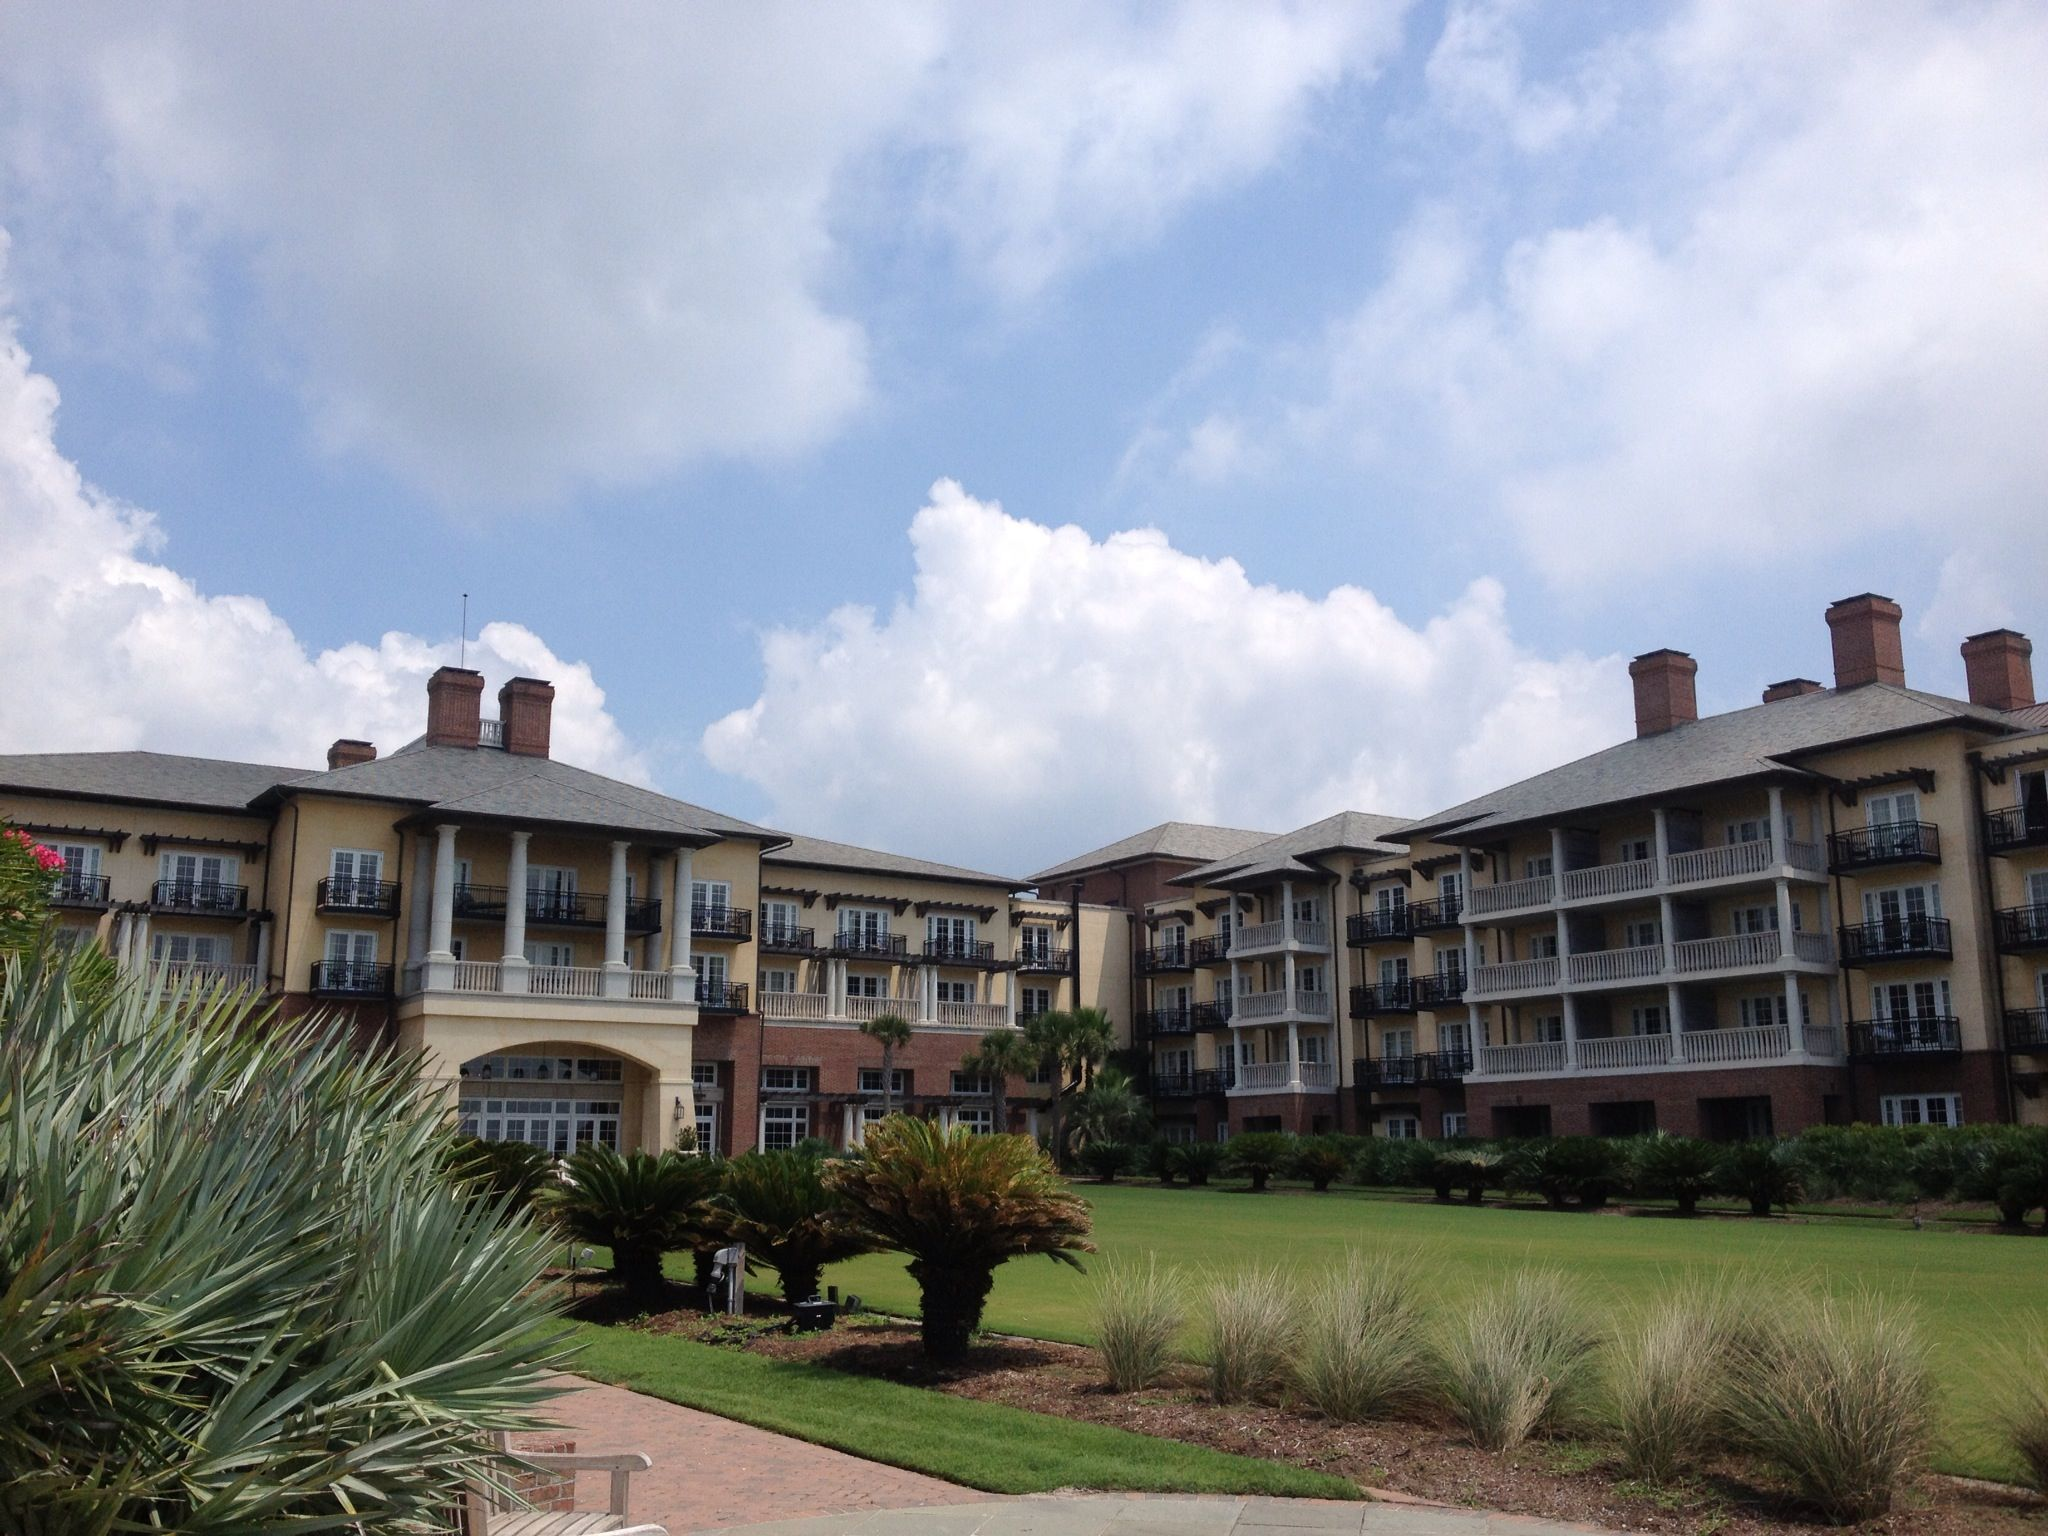 Kiawah resort, SC